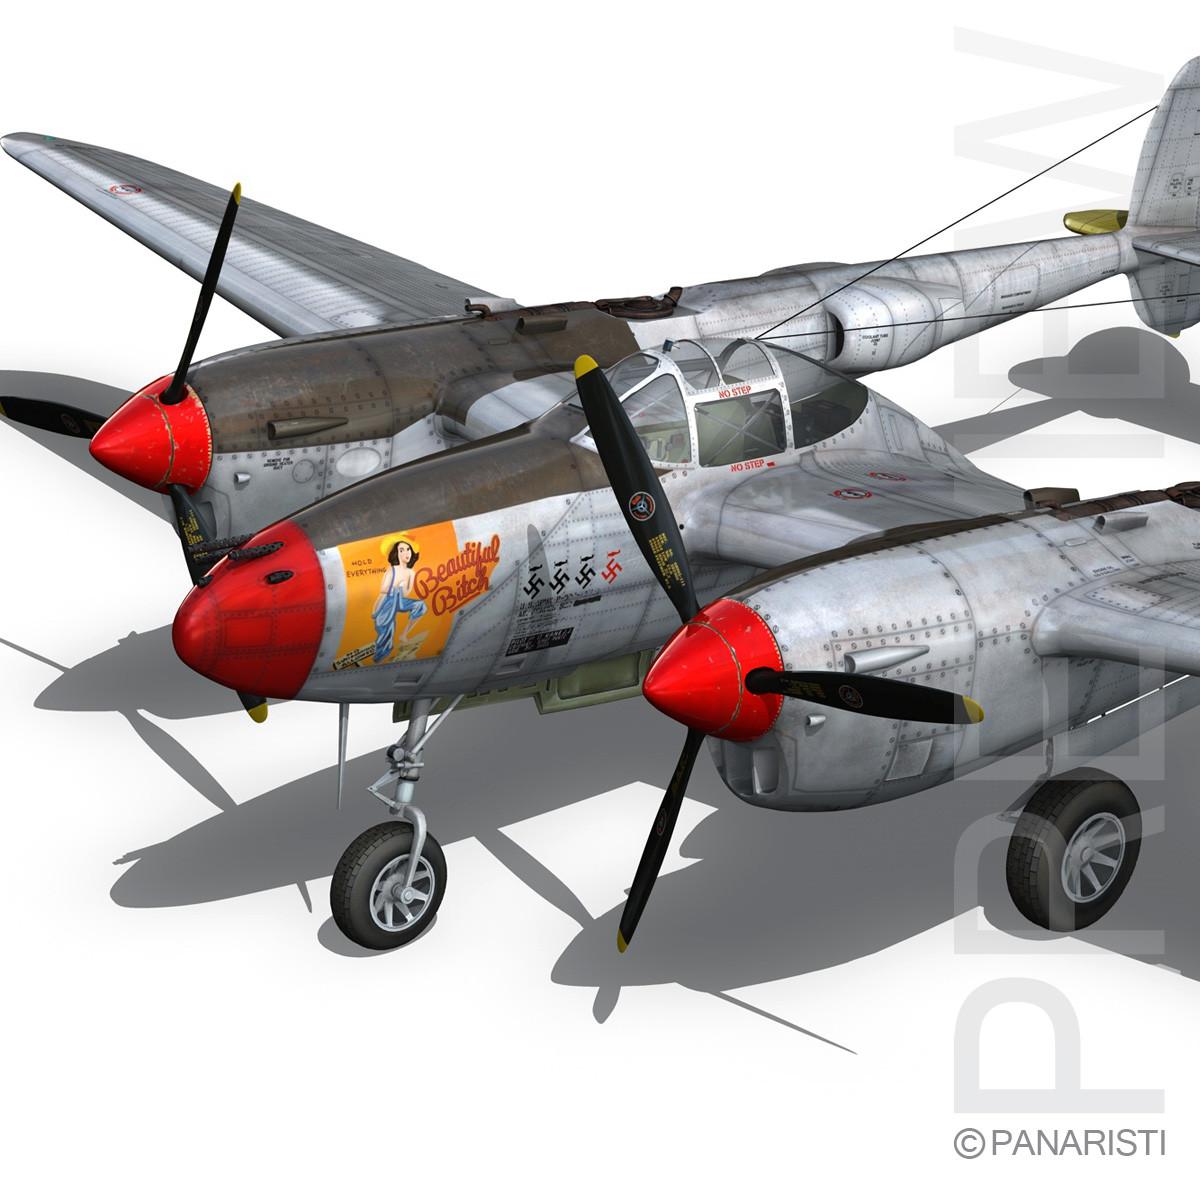 Lockheed P-38 Lightning - Beautiful Bitch